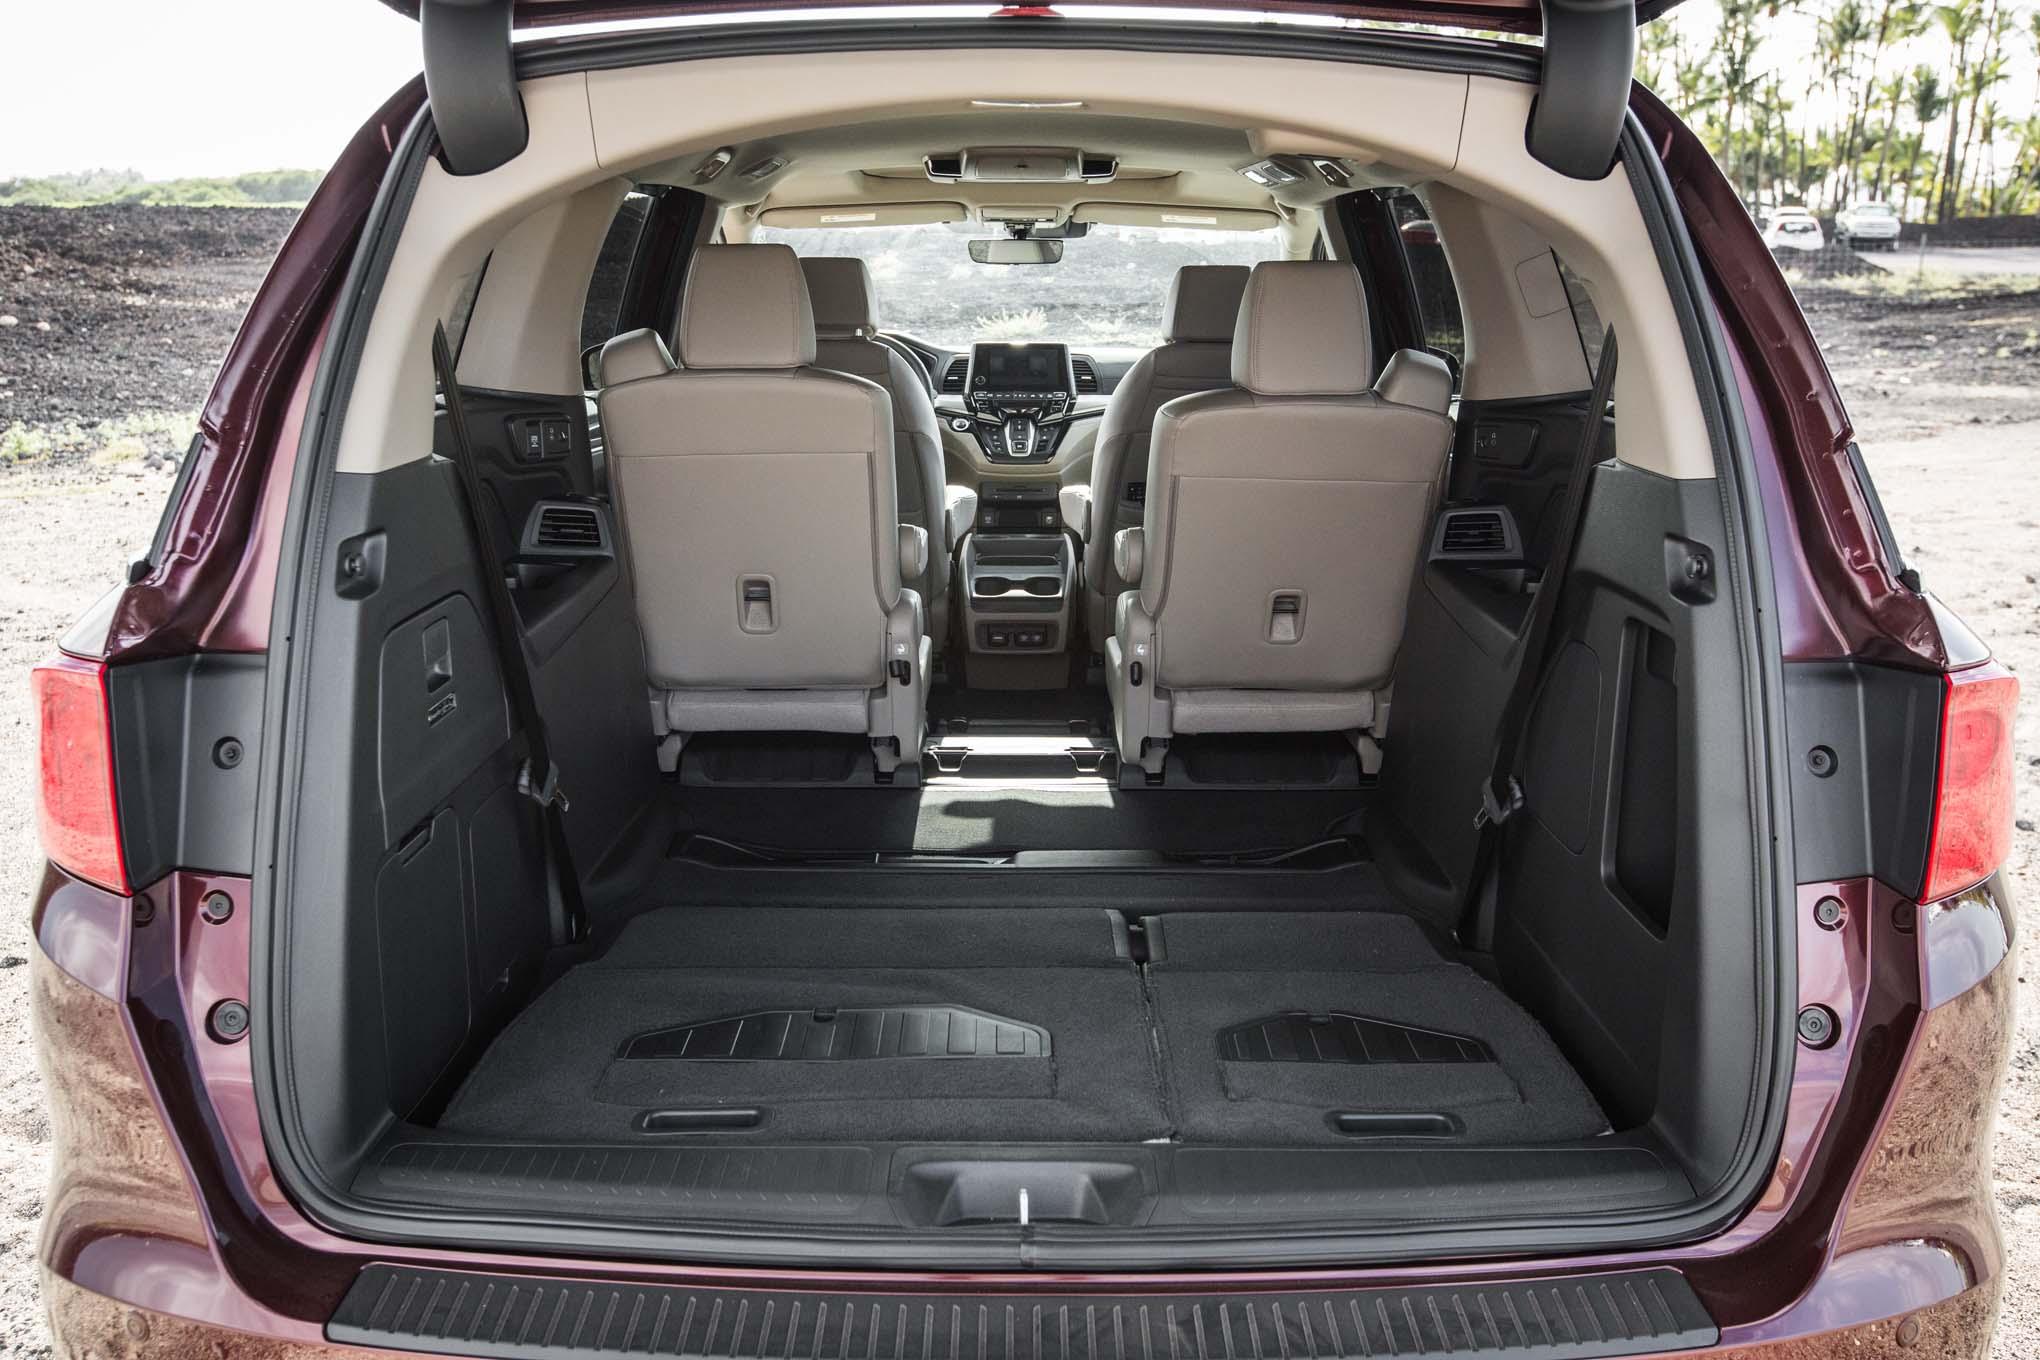 2018 Honda Odyssey Rear Cargo Space Motor Trend En Espa 241 Ol